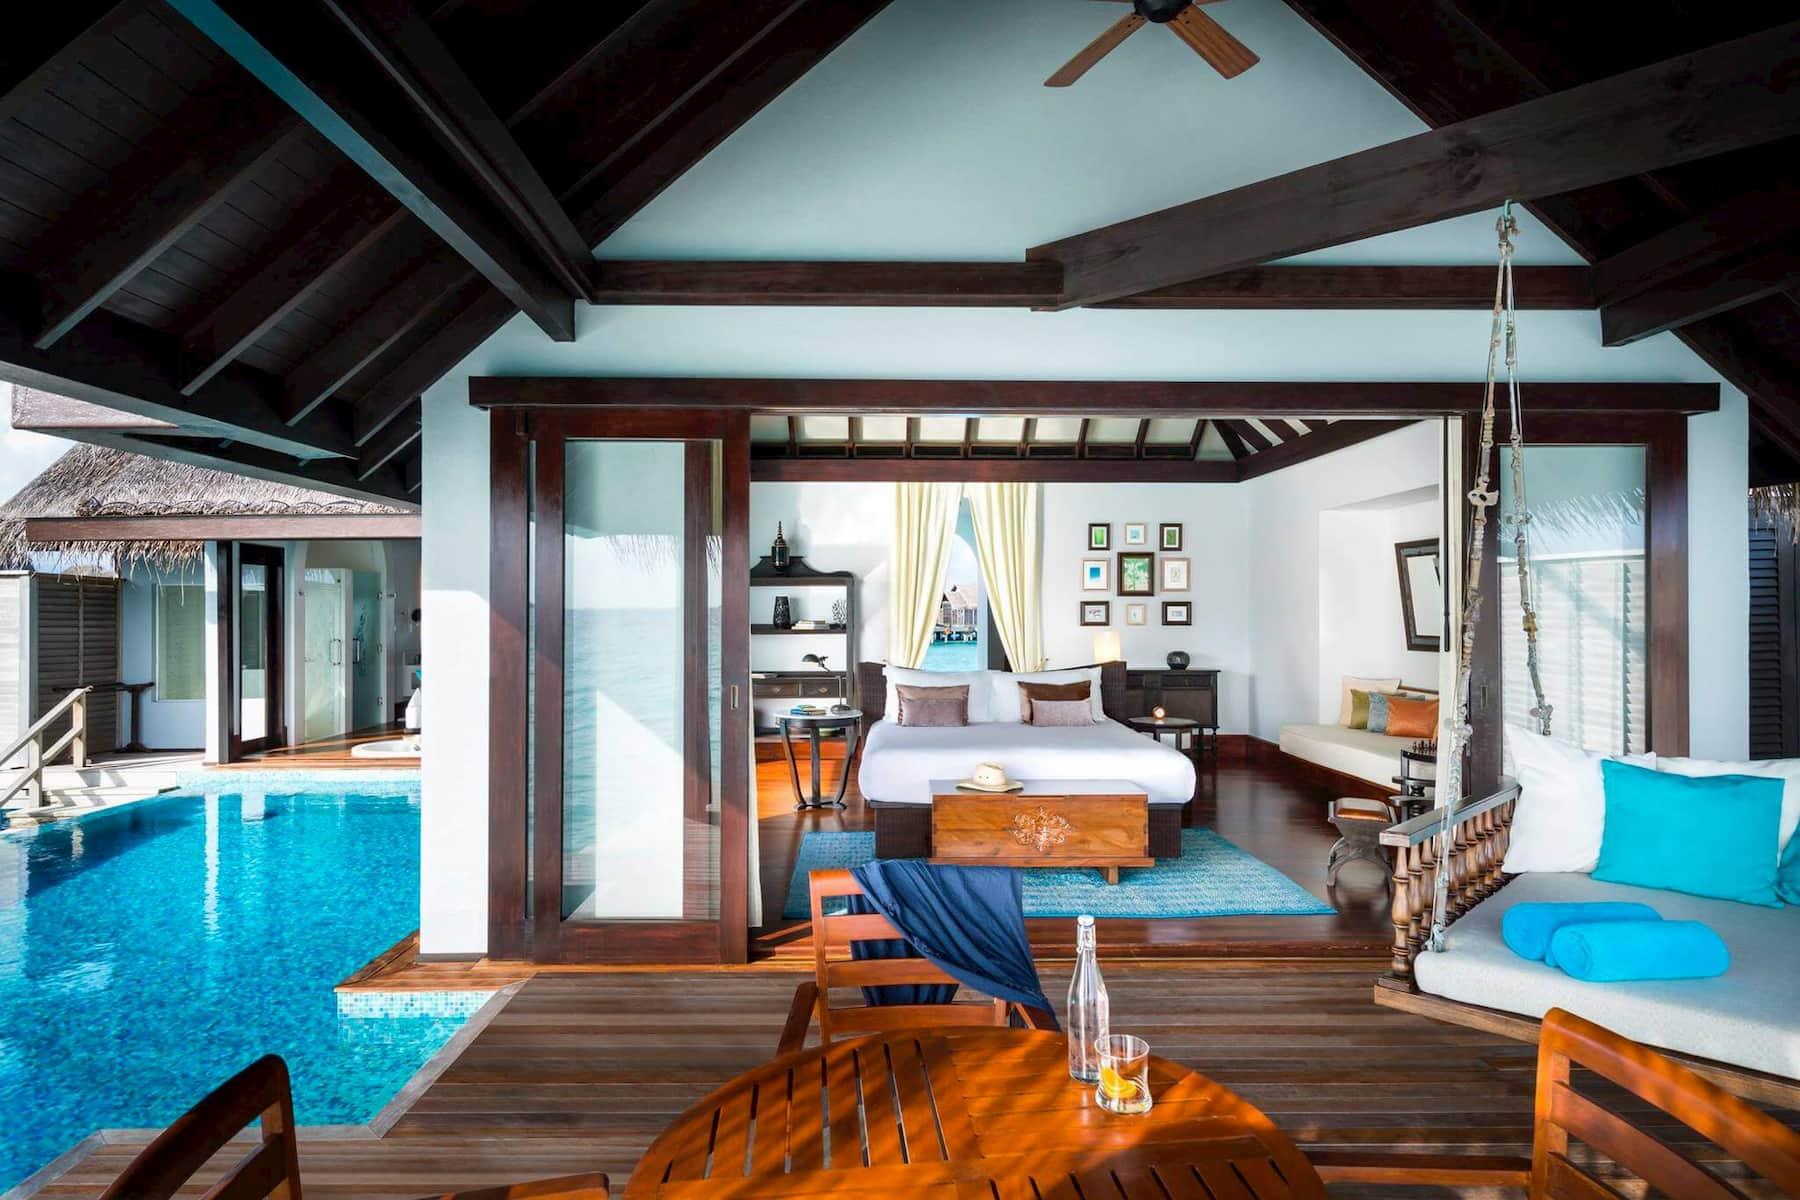 Anantara Kihavah Villas resort Maldive overwater pool villa